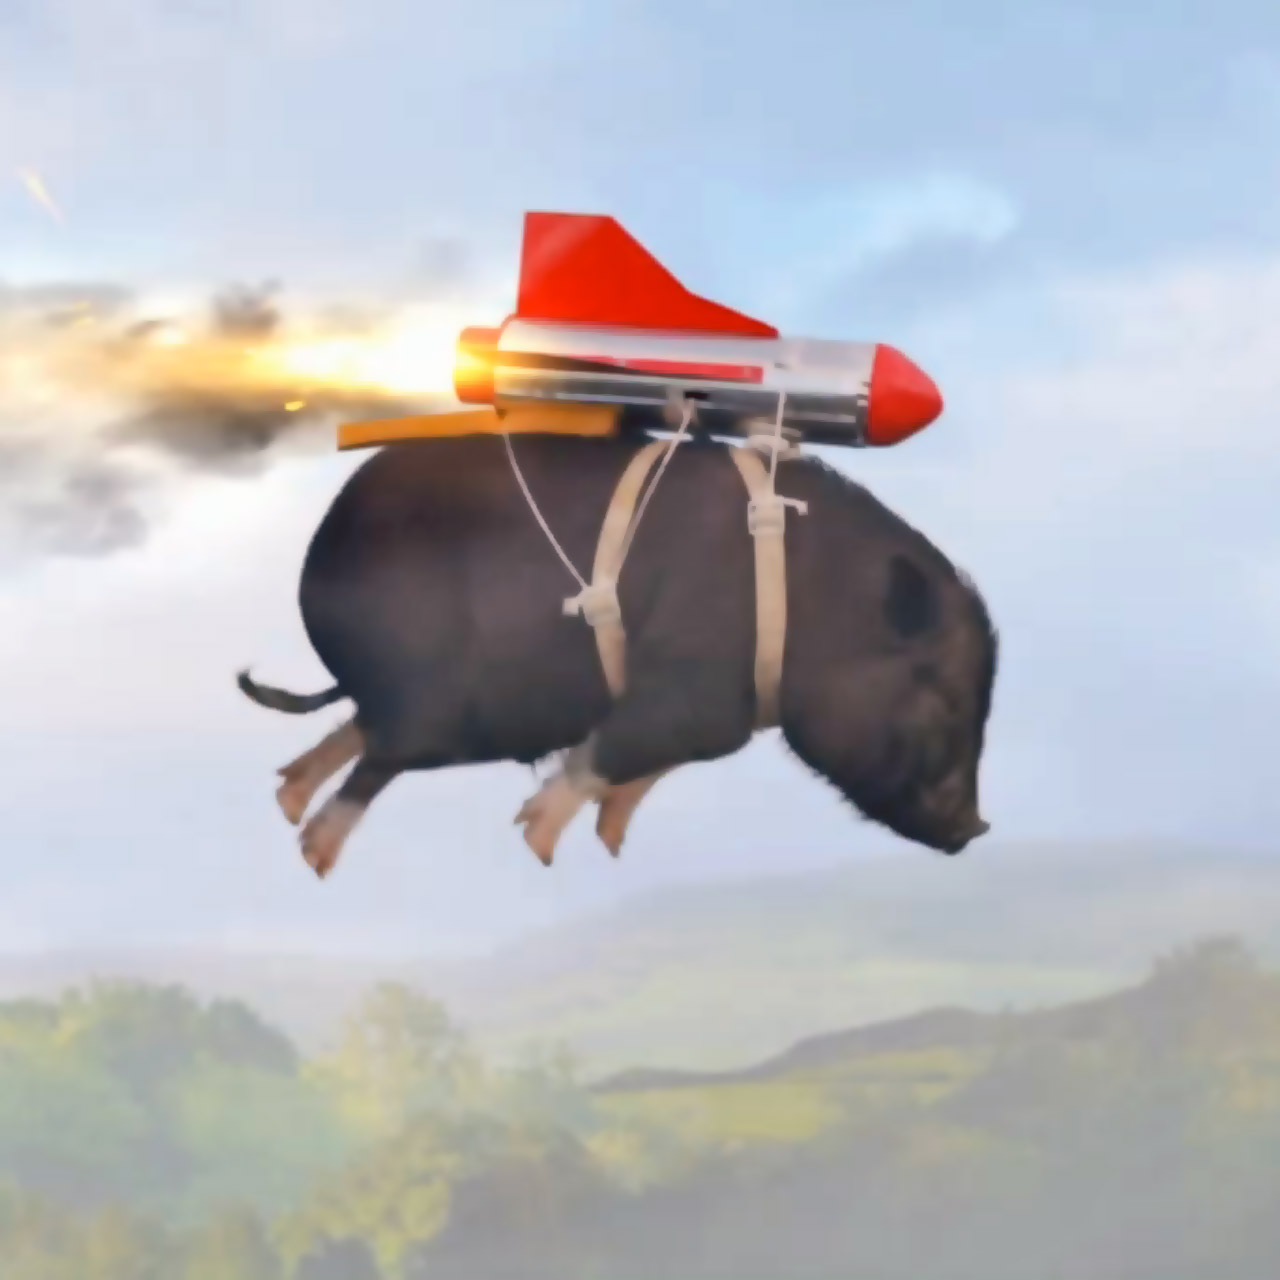 Doritos 2015 Super Bowl commercial: When Pigs Fly